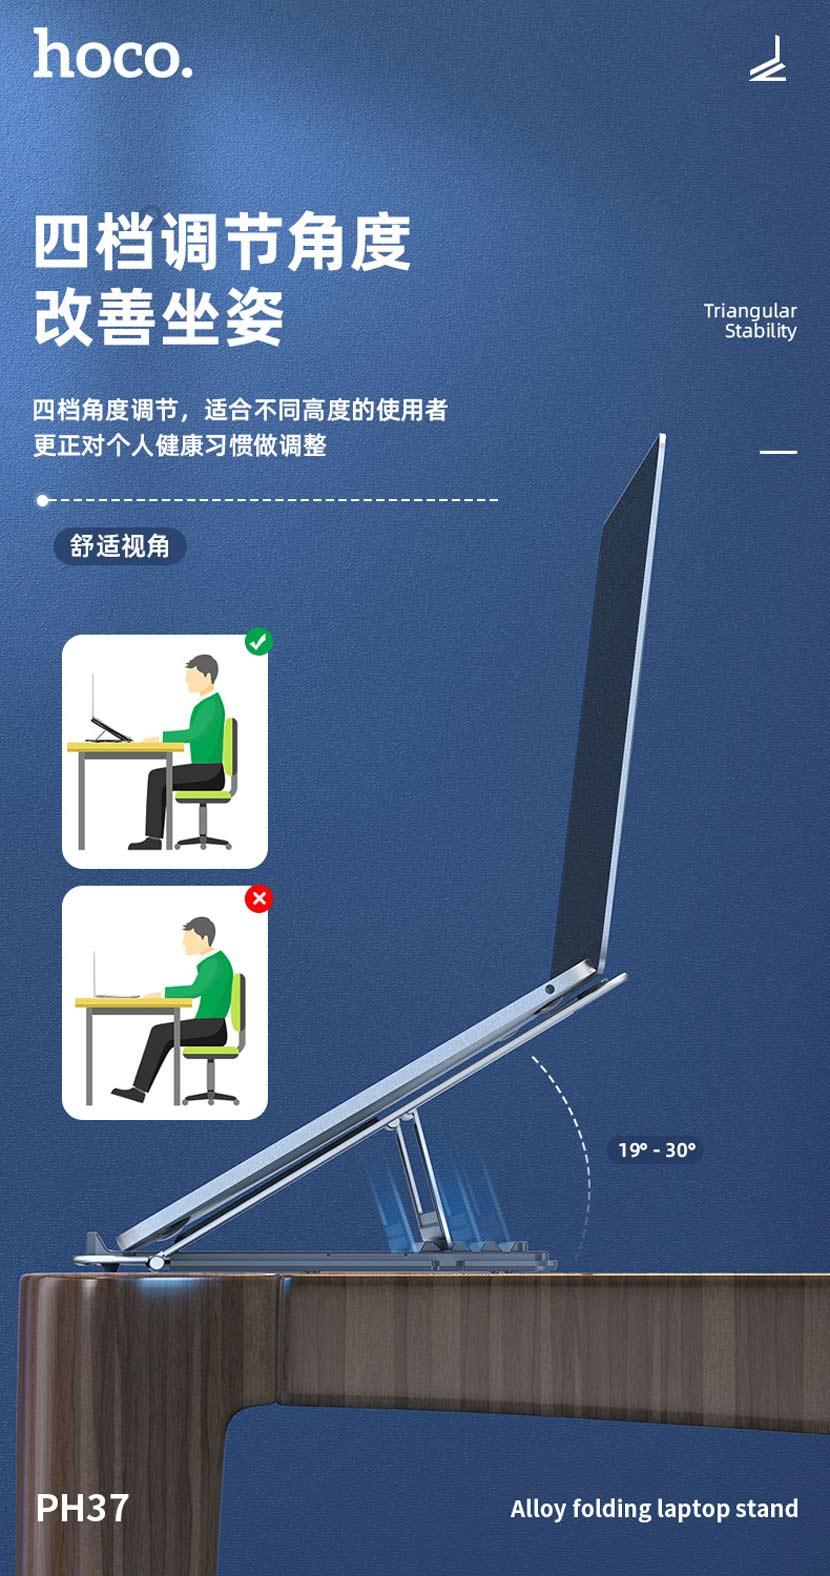 hoco news ph37 excellent aluminum alloy folding laptop stand adjustment cn